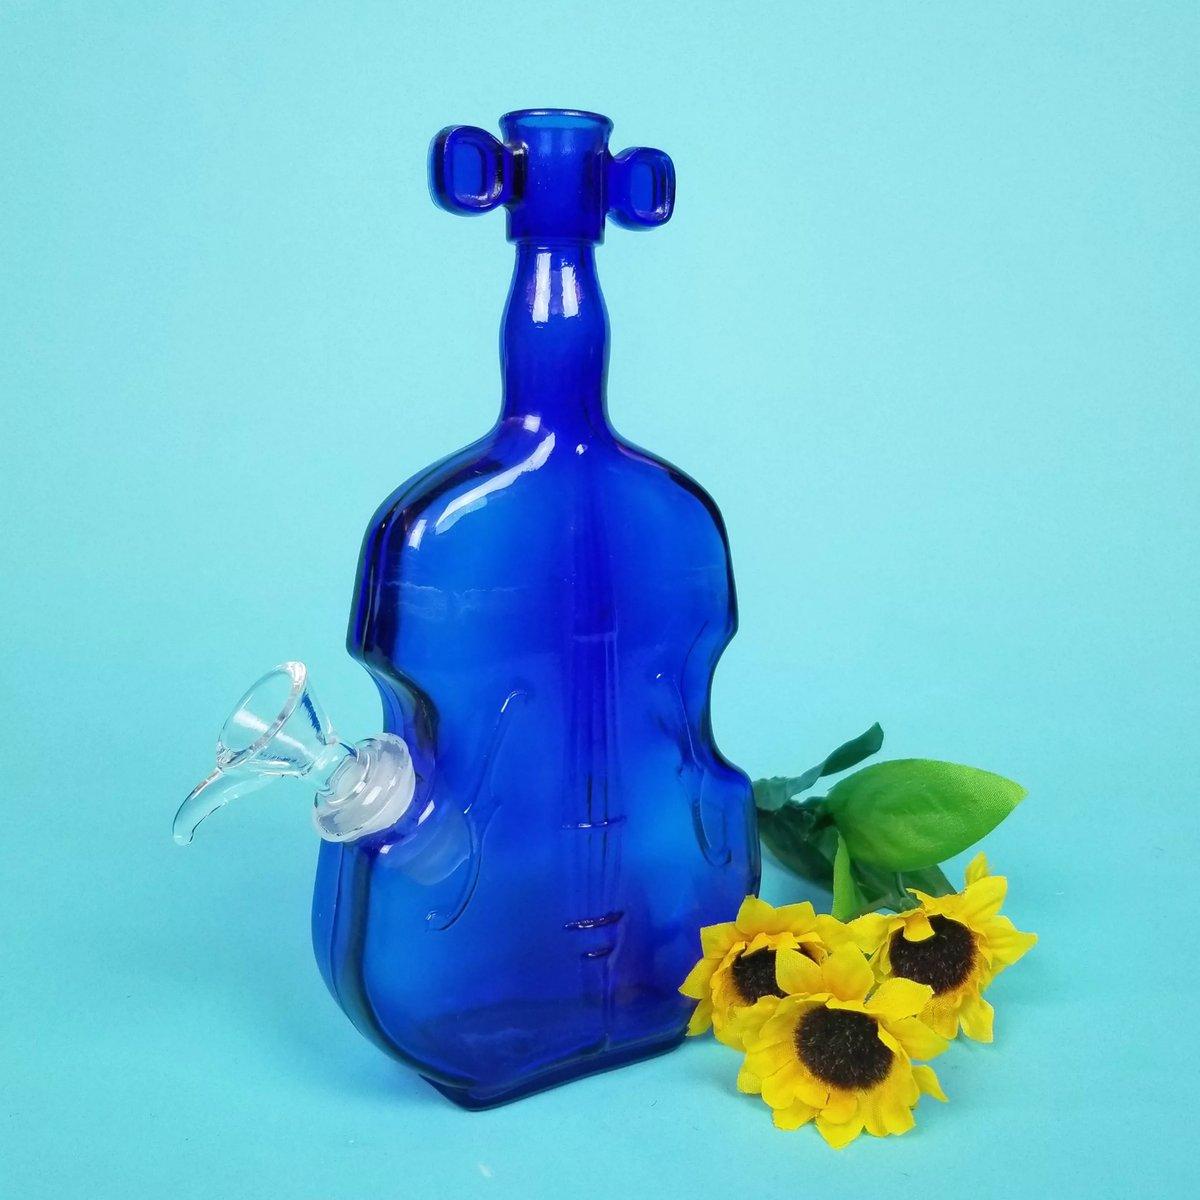 Image of Azure Cello